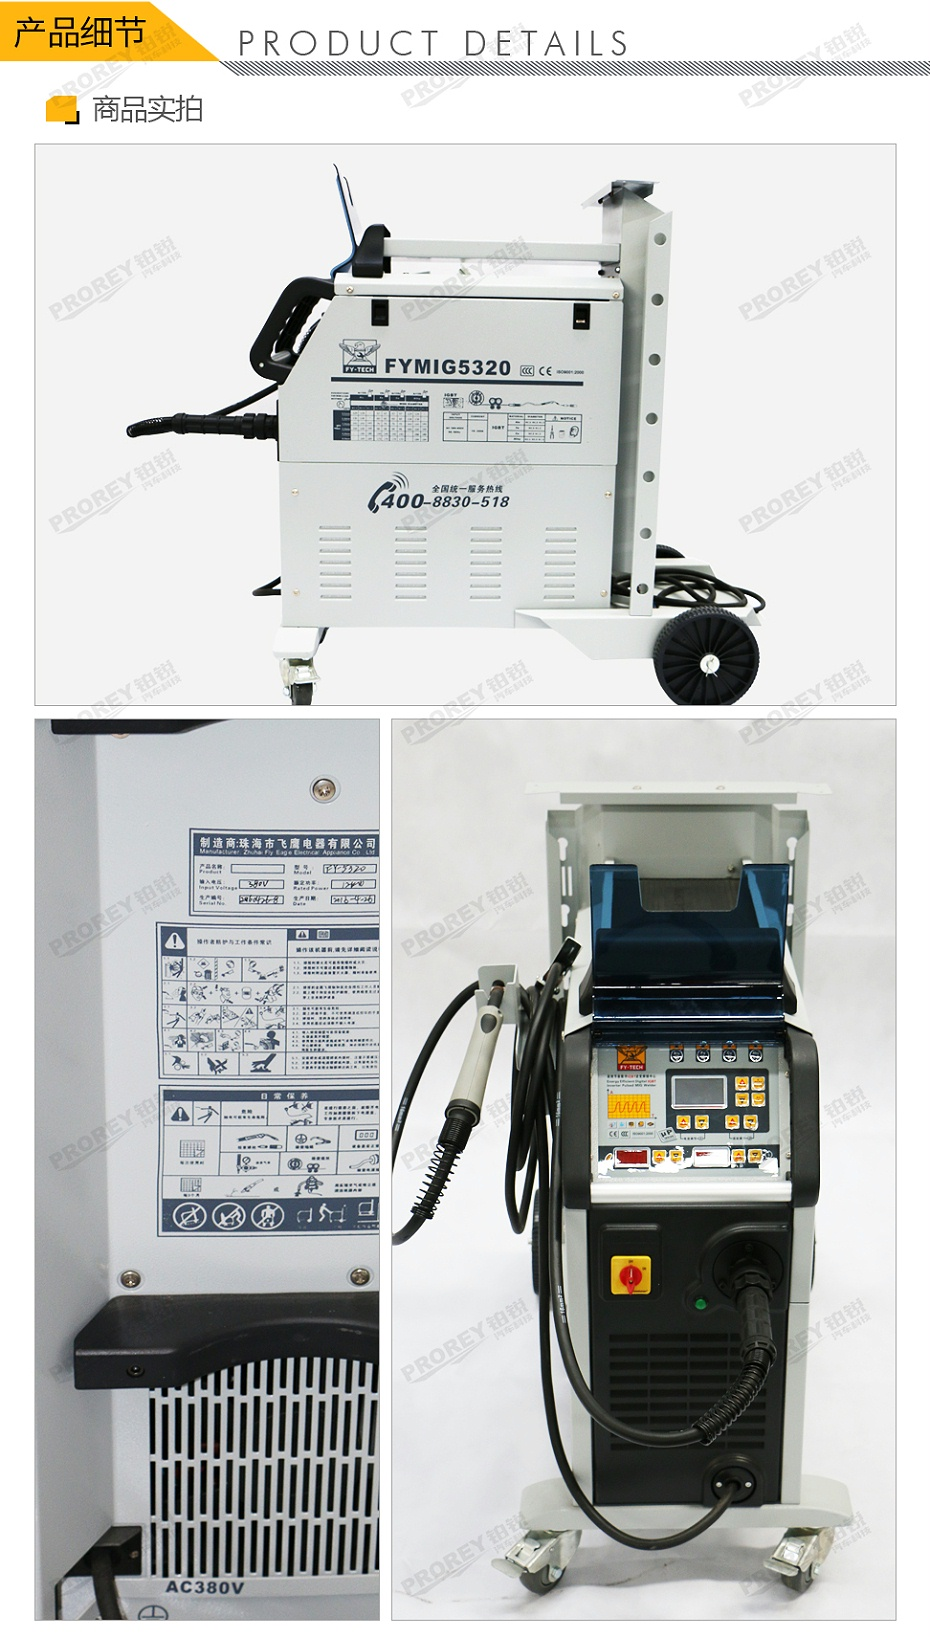 GW-140080022-飞鹰 FYMIG5320 逆变焊机-3